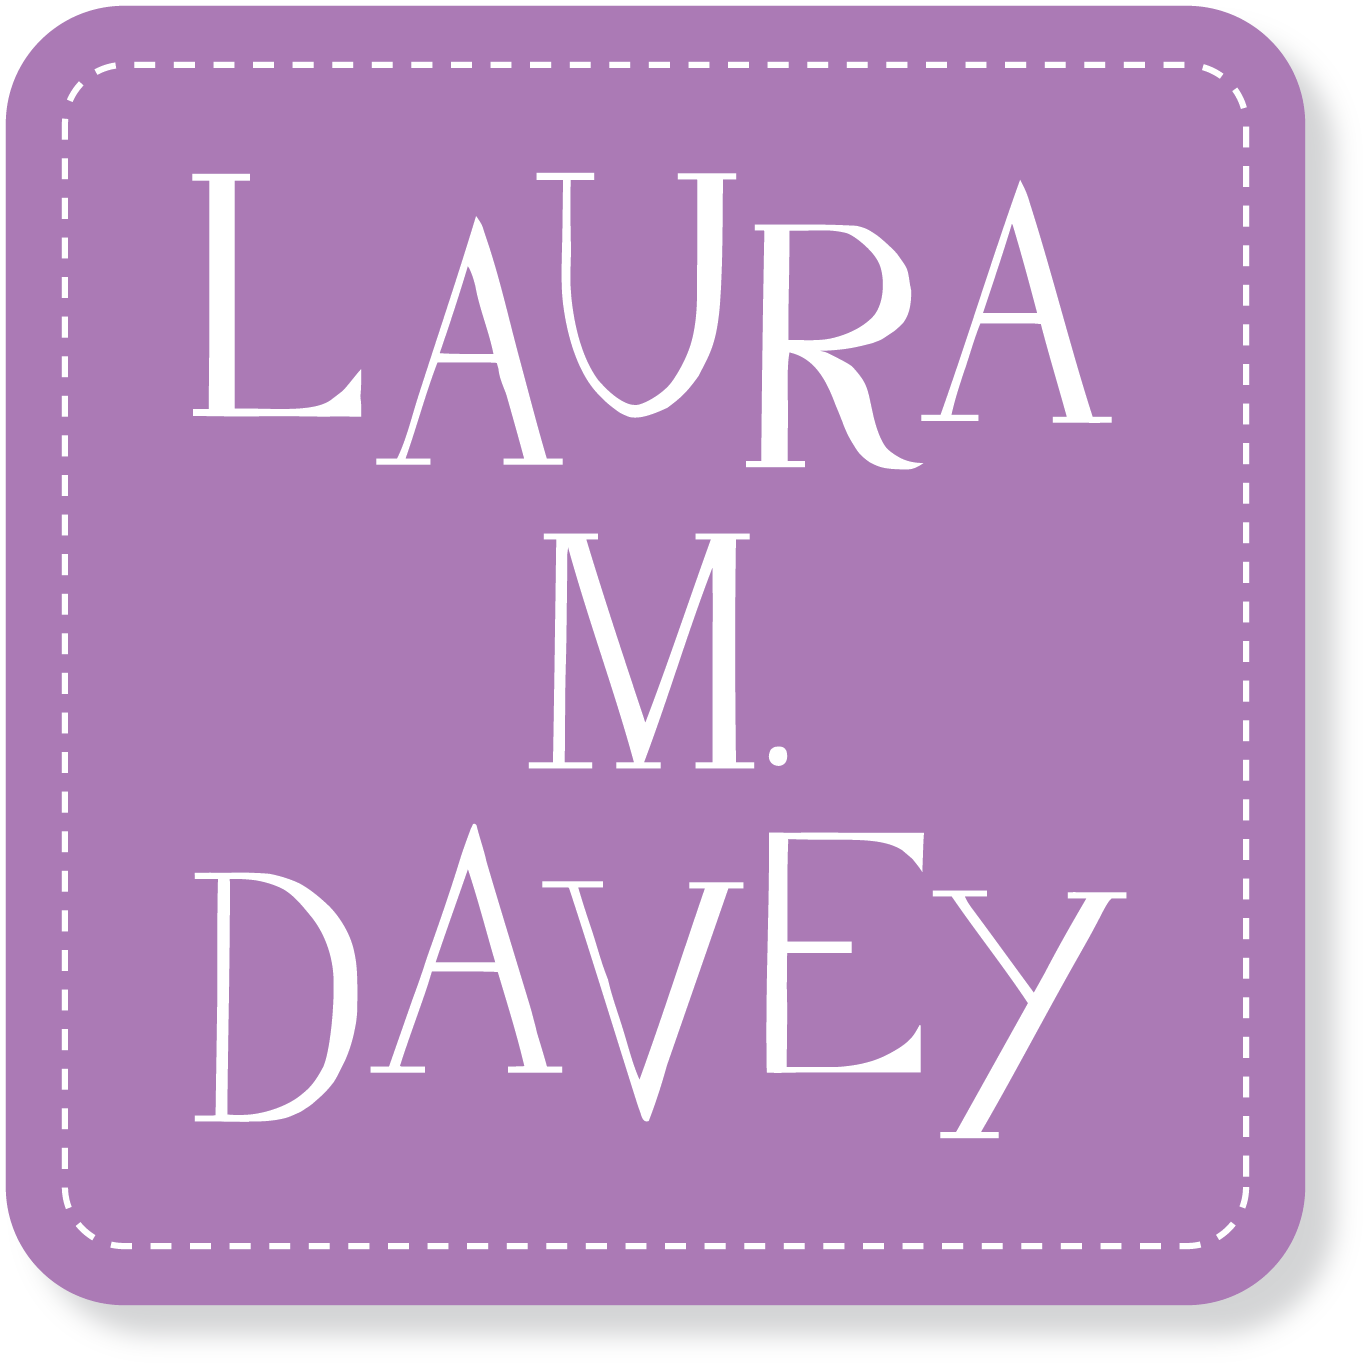 Vintage Wedding Dresses Bristol: Laura M. Davey